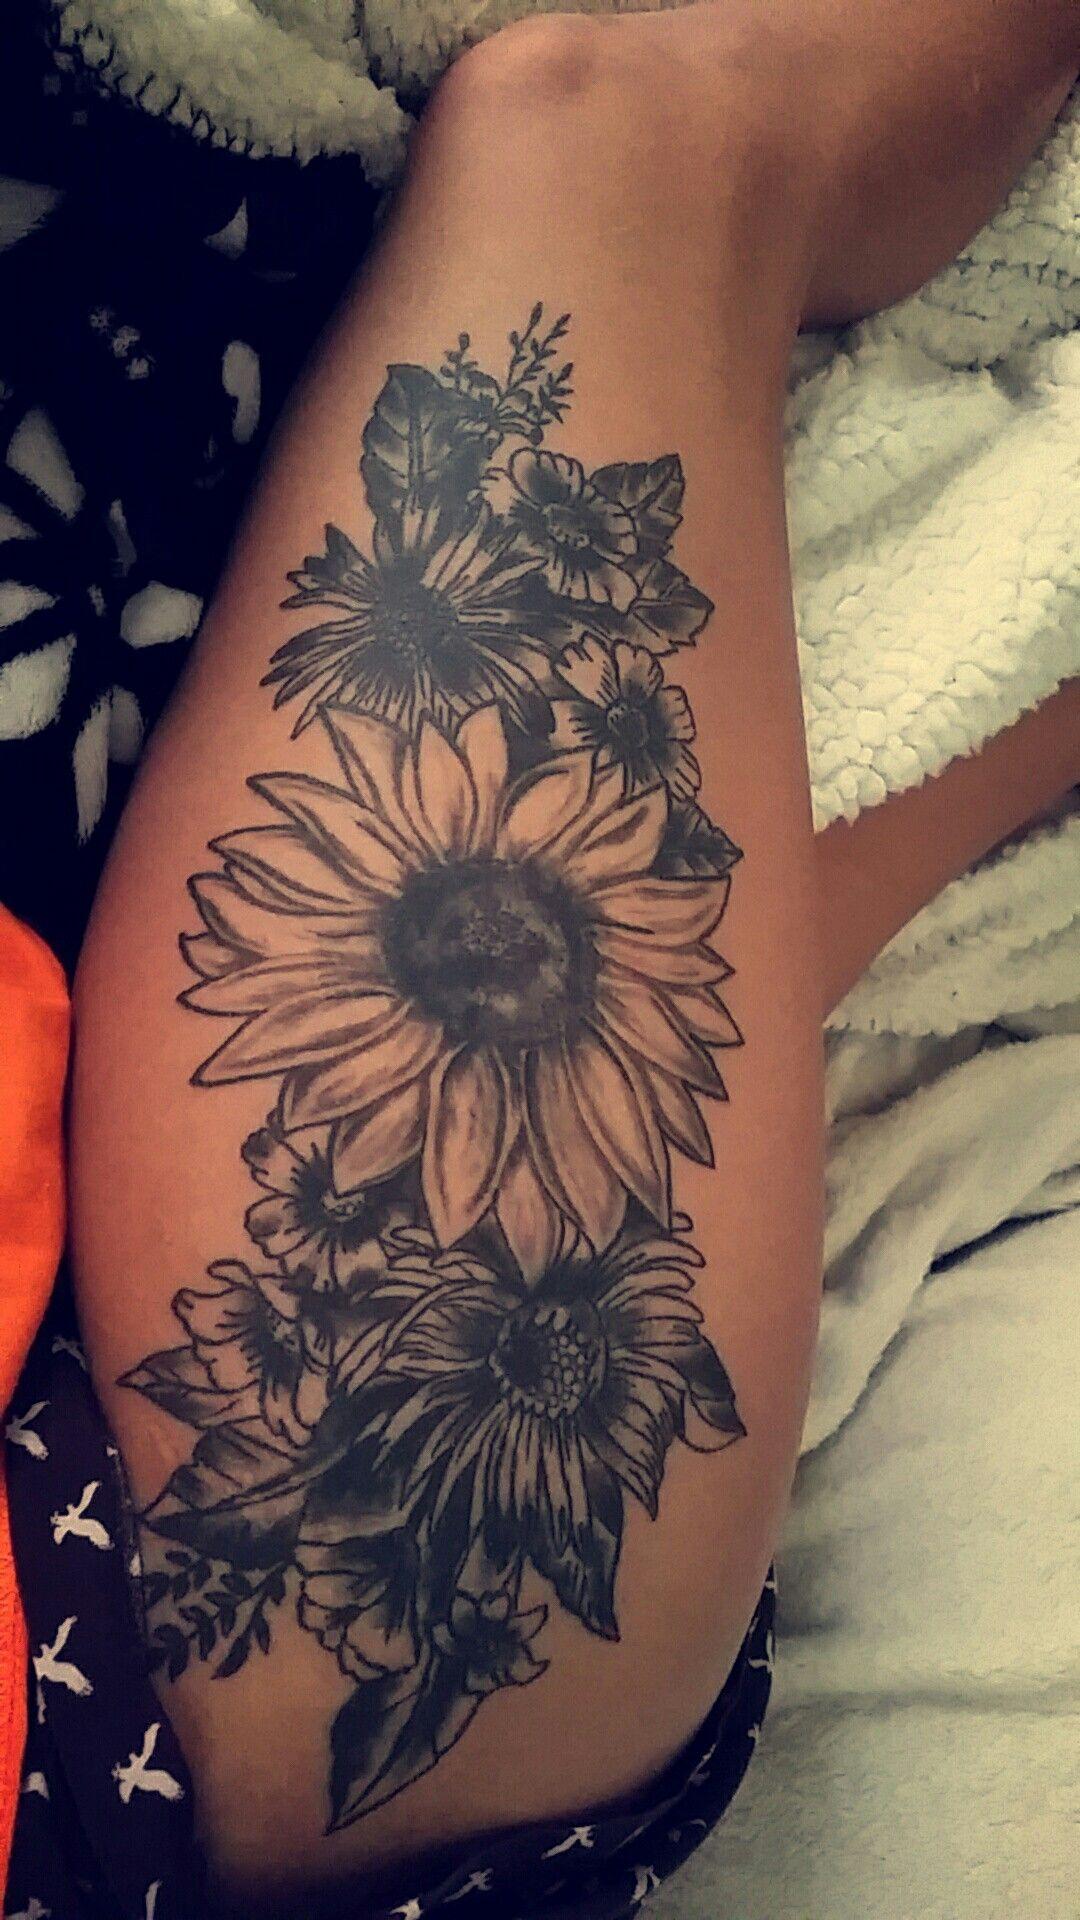 Thigh Floral Tattoo Thigh Piece Tattoos Flower Thigh Tattoos Tattoos